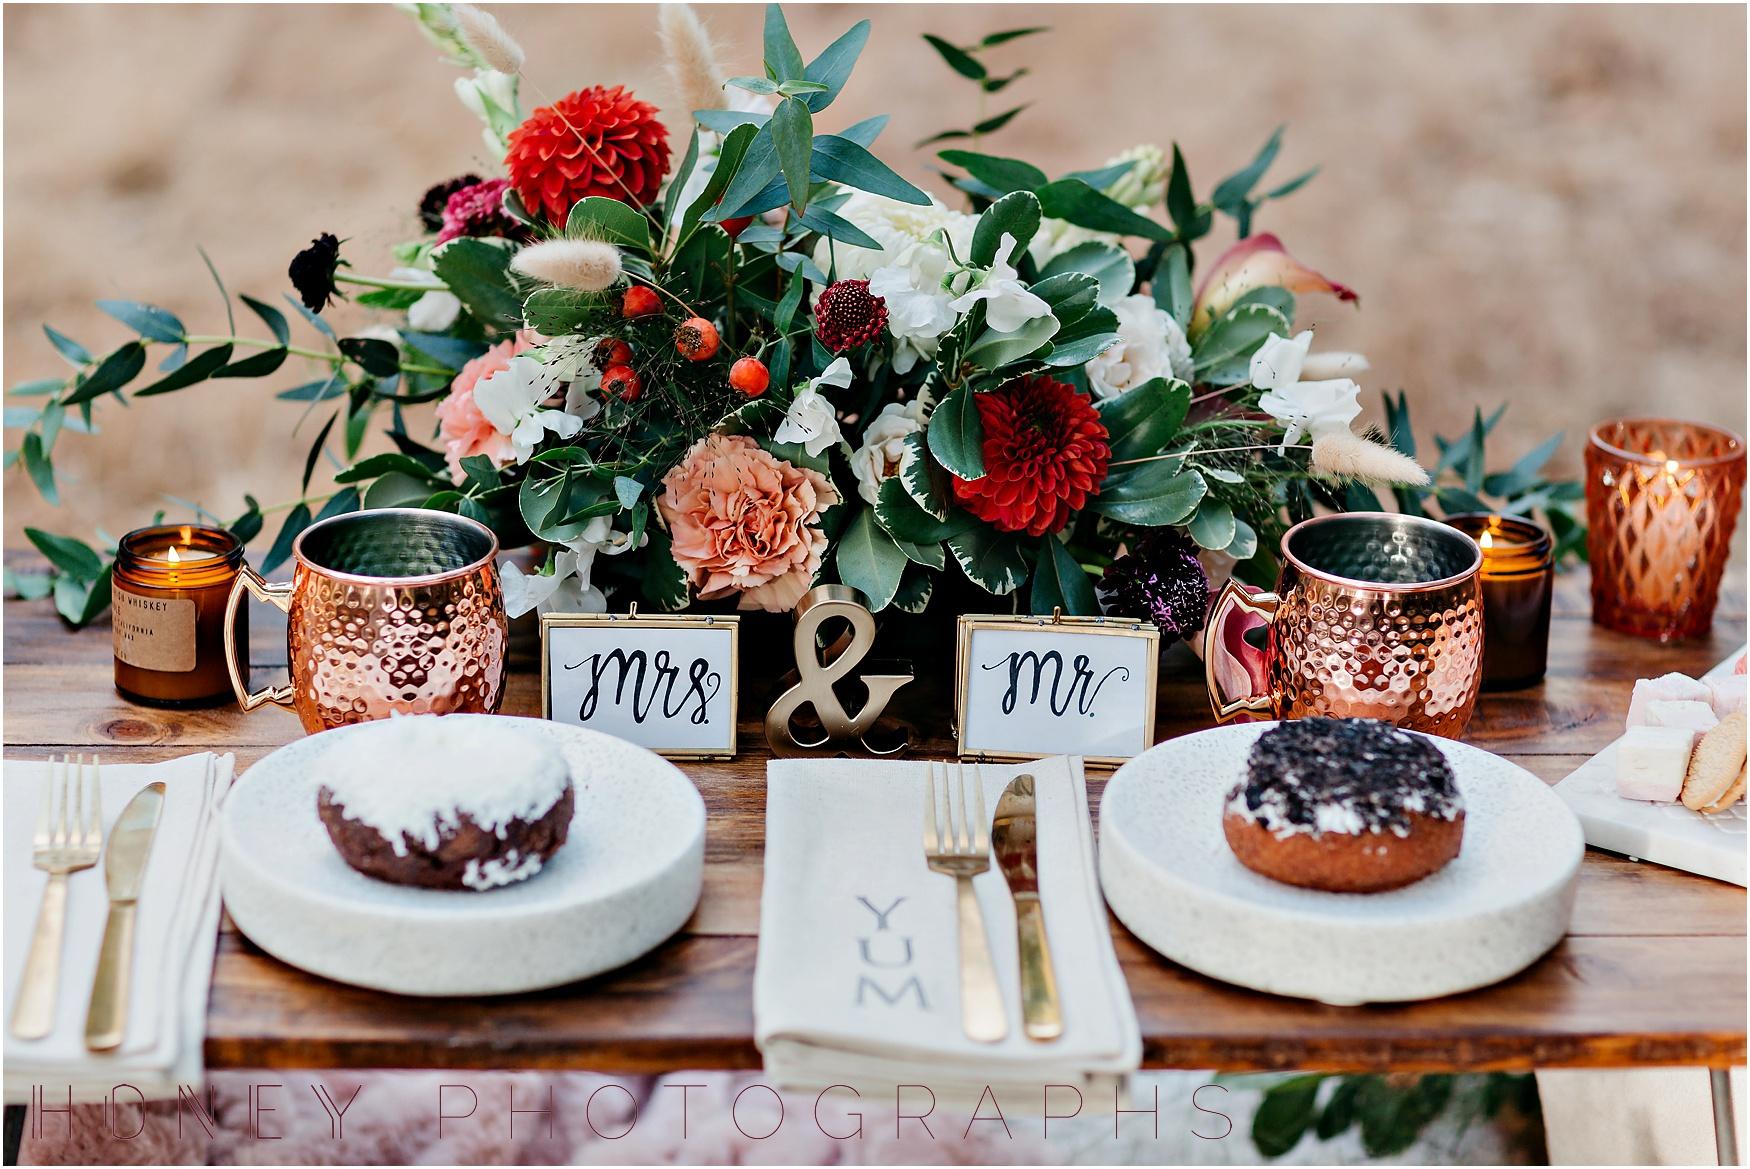 picnic-wedding-rustic-sweetheart-table-felicita-park-boho03.jpg